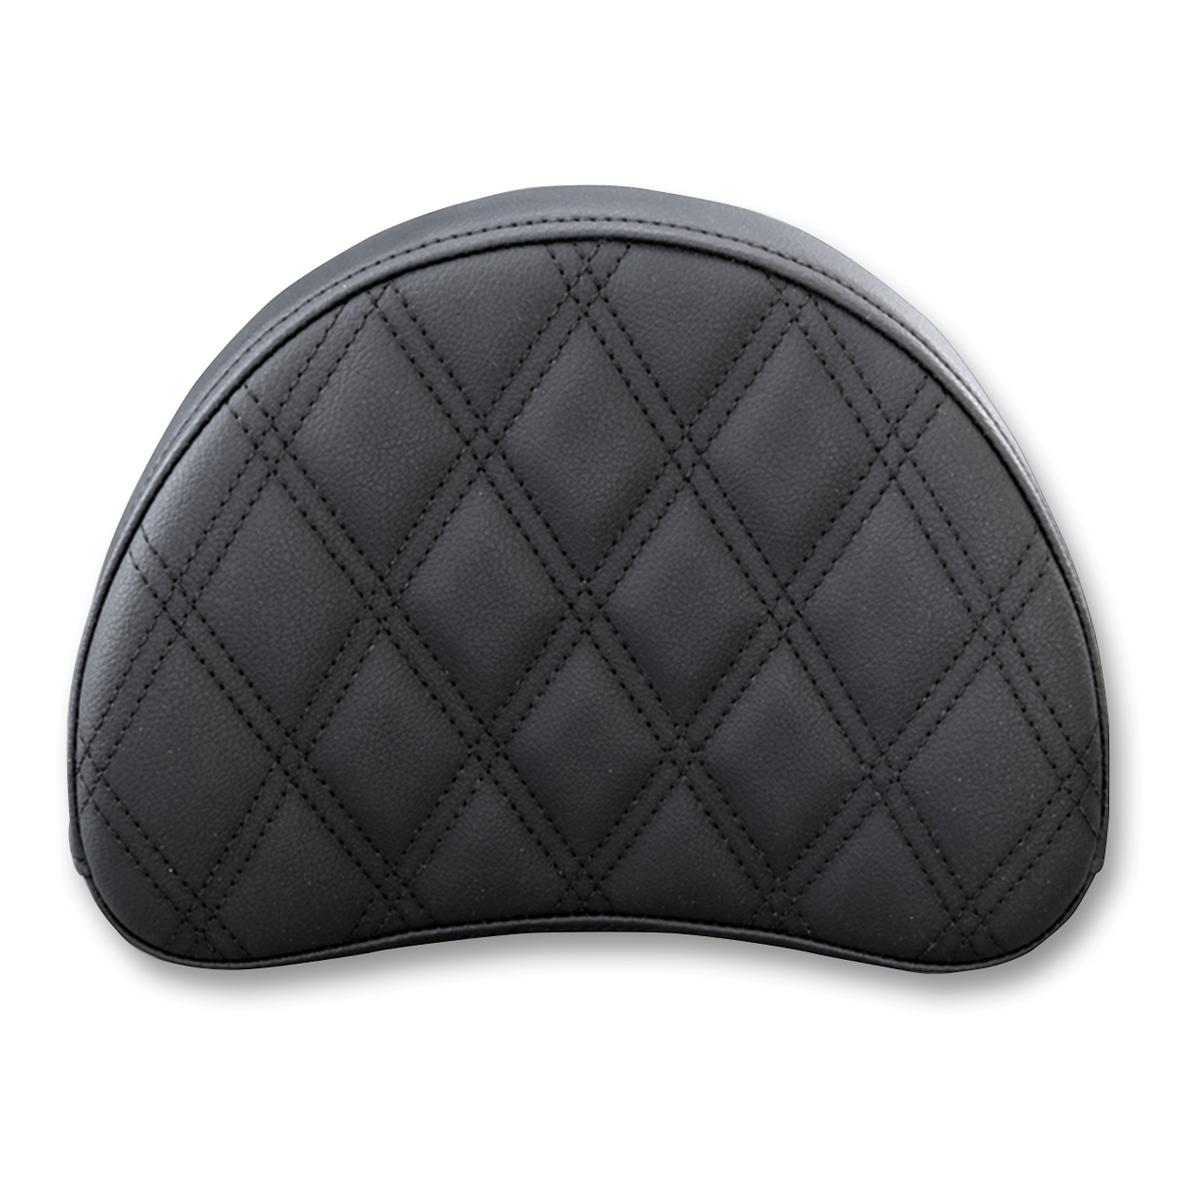 Saddlemen Sissy Bar Pad Black 9″ Diamond Stich